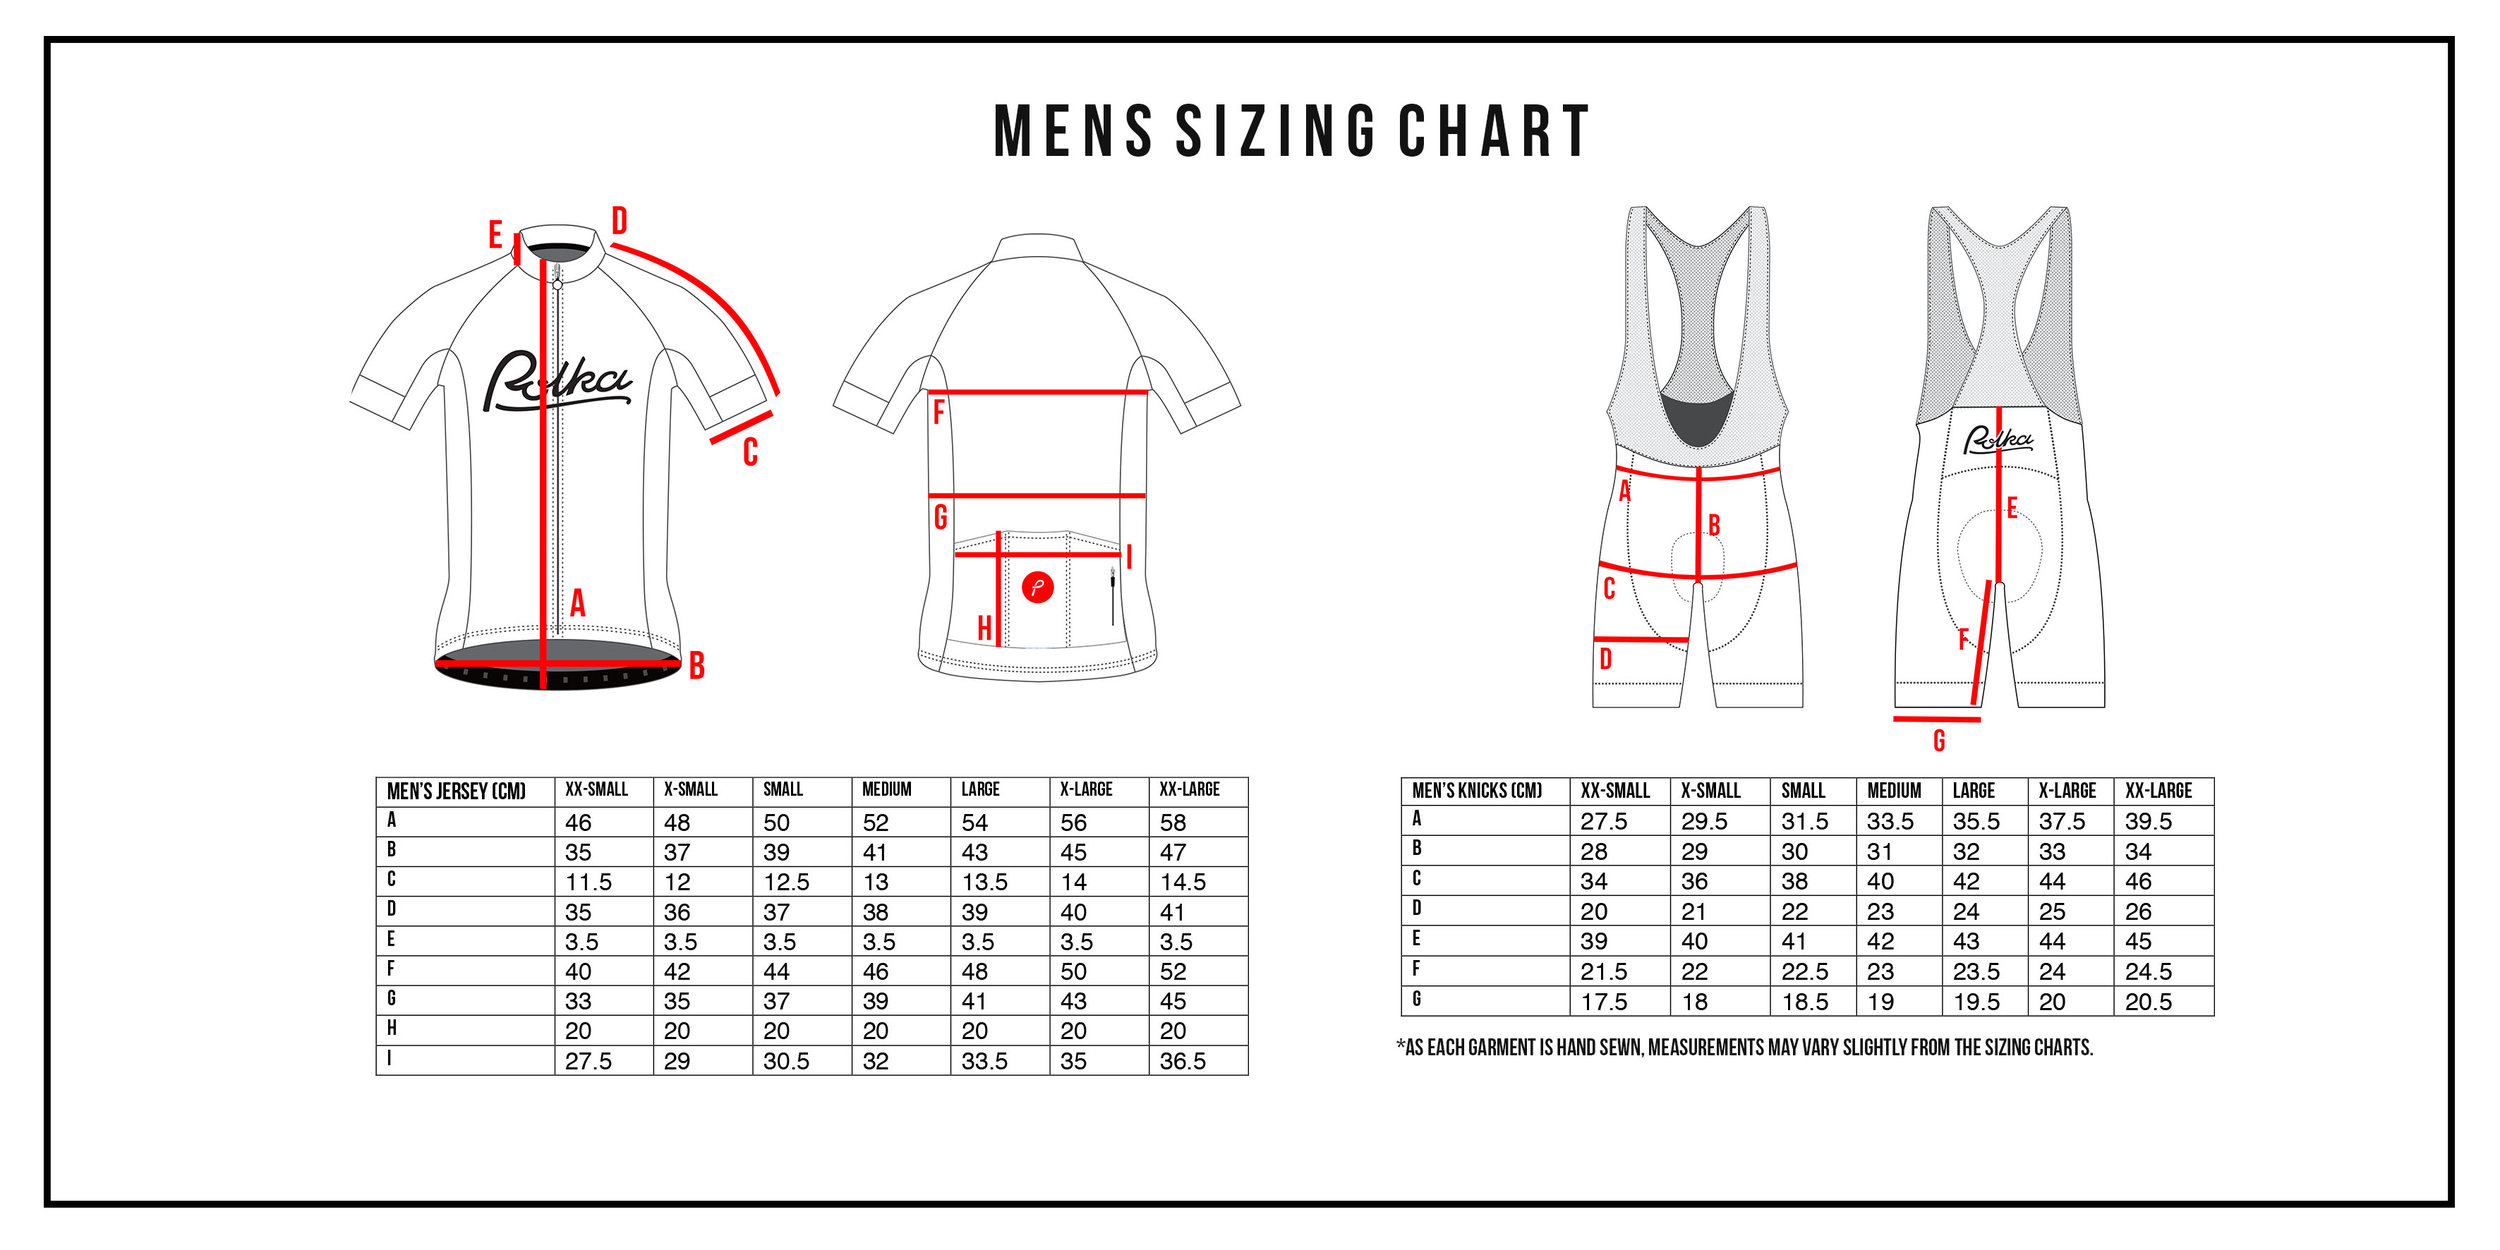 womens sizing chart.jpg